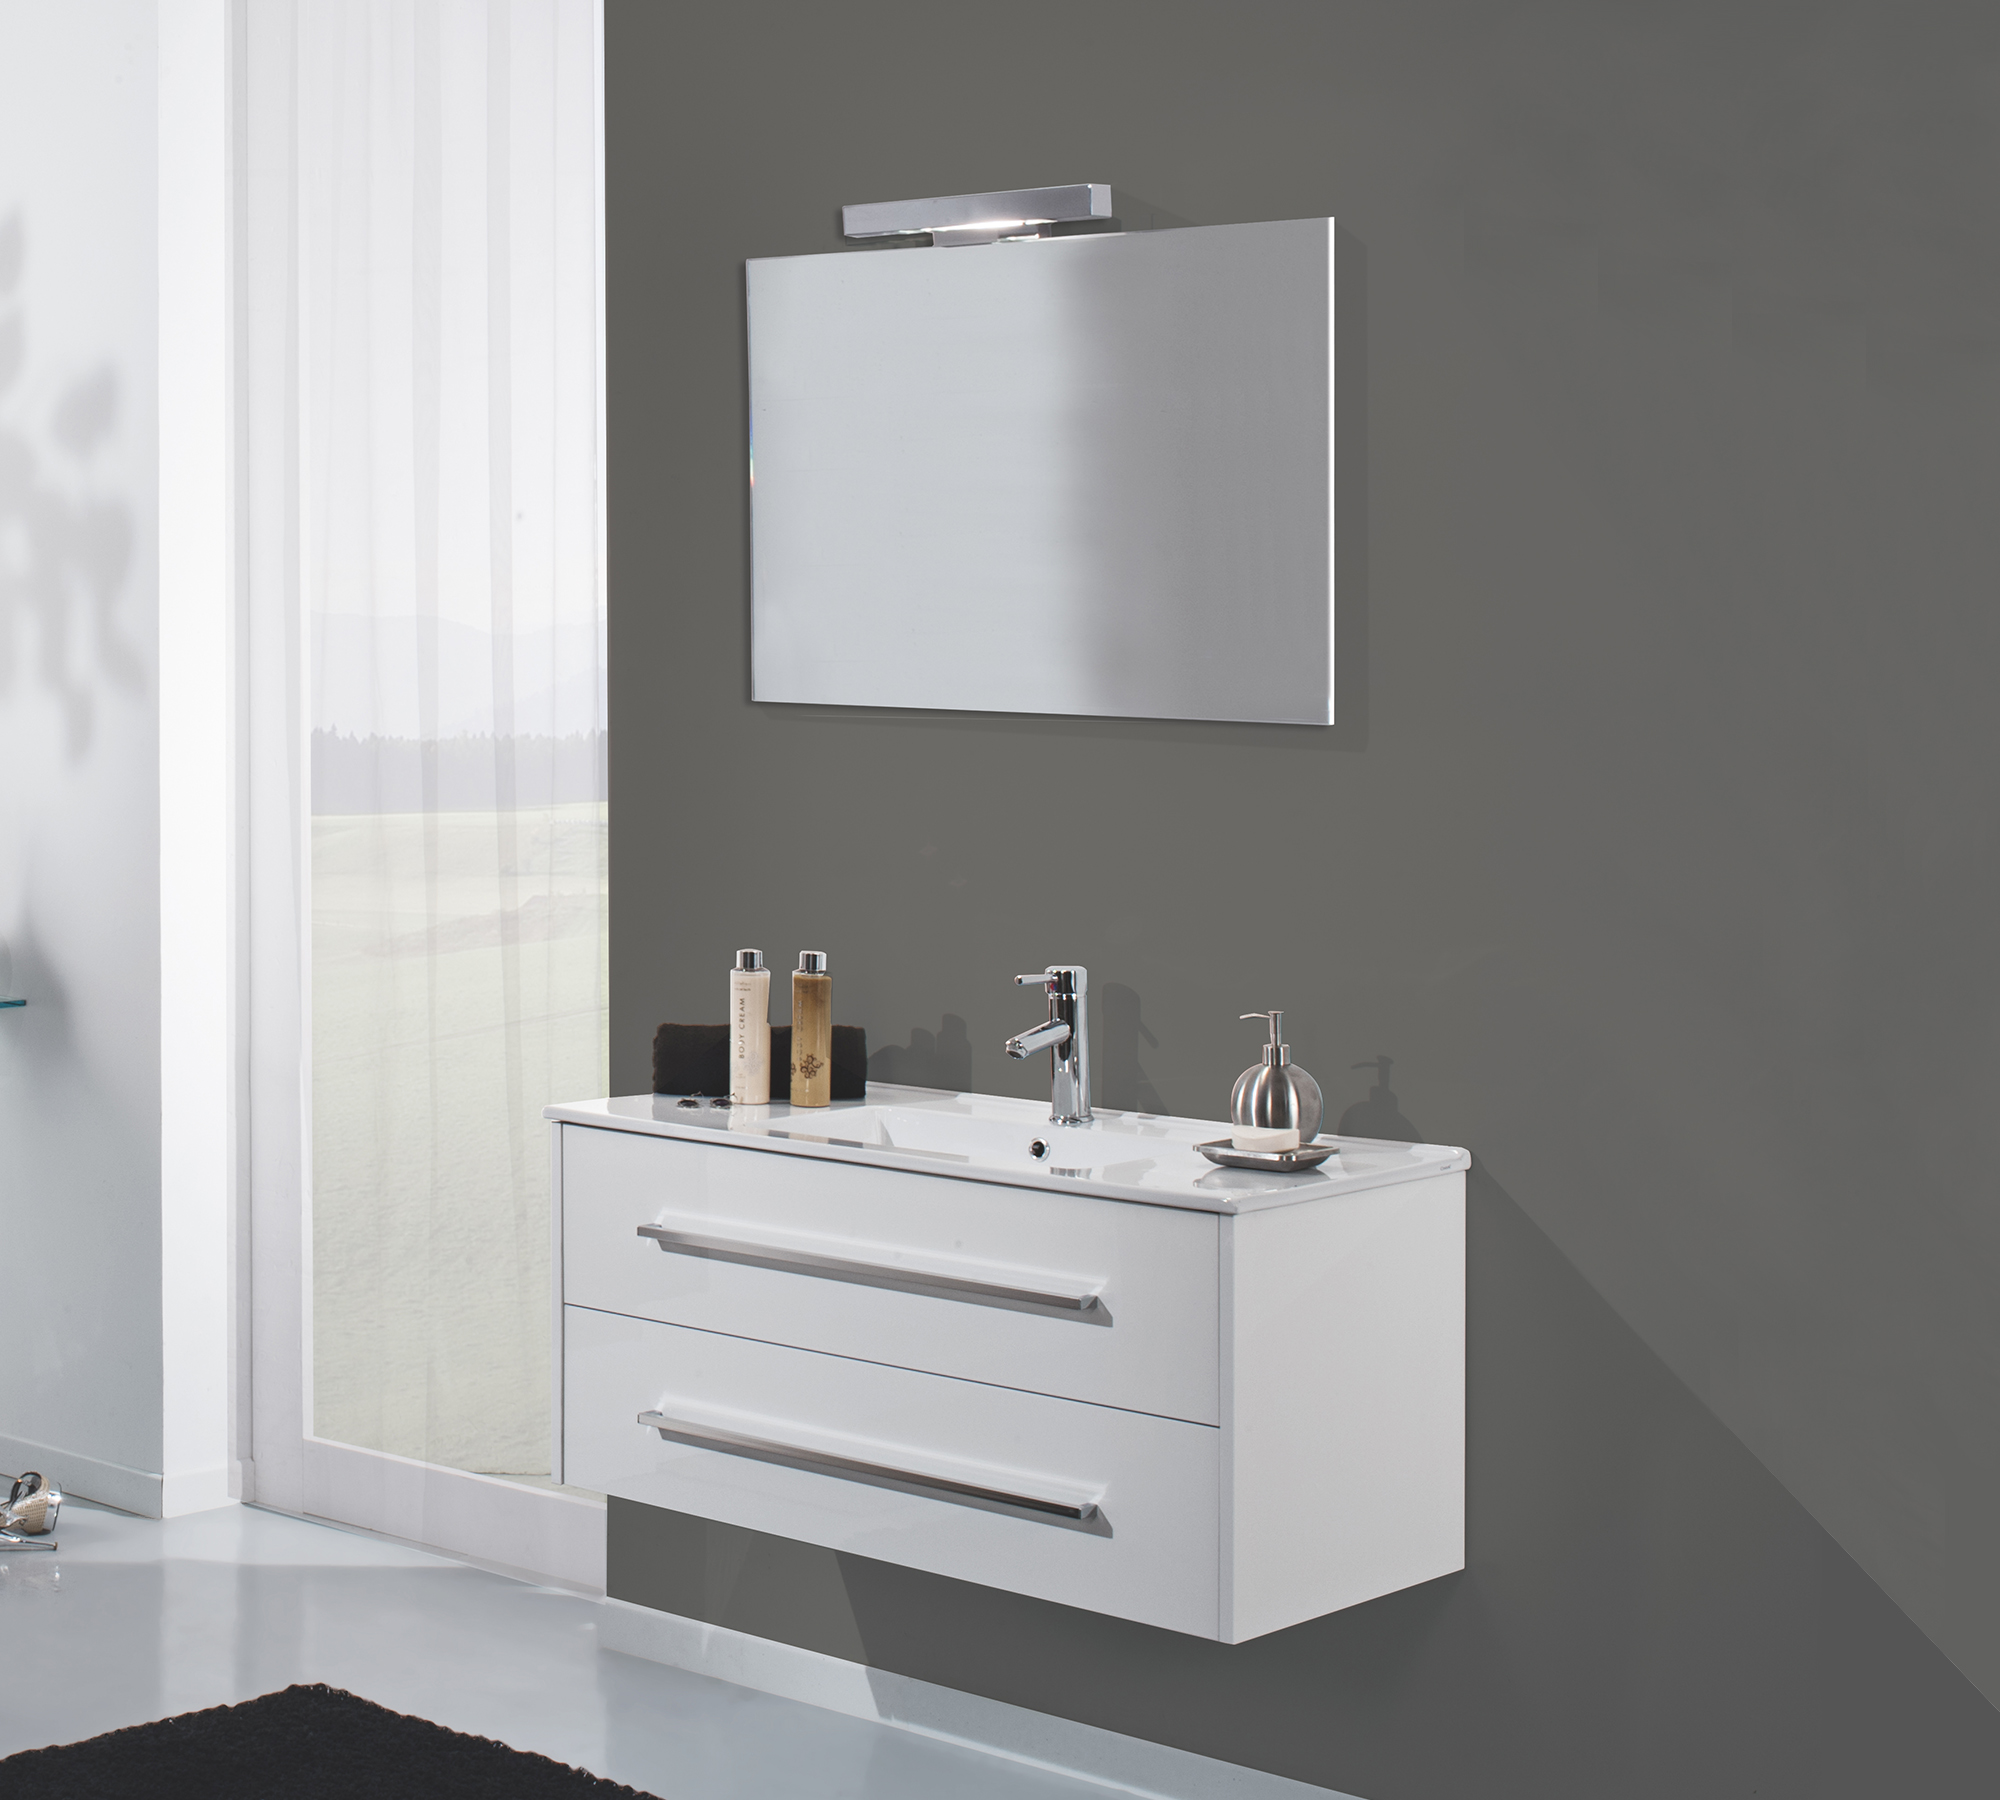 Arredo bagno moderno bianco duzzle for Arredo bagno moderno on line